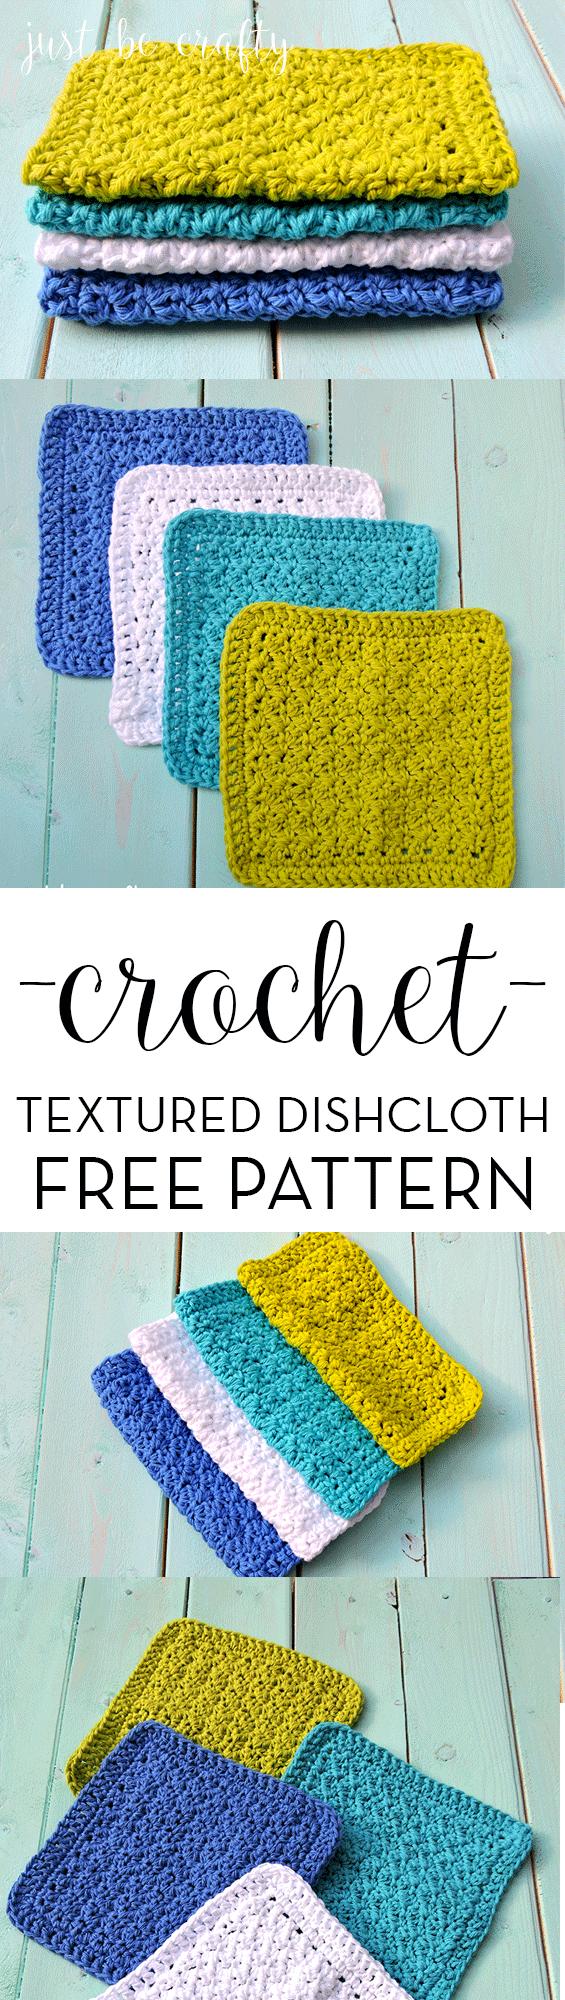 Crochet Textured Dishcloth Pattern - Free Pattern by   Me gustas me ...